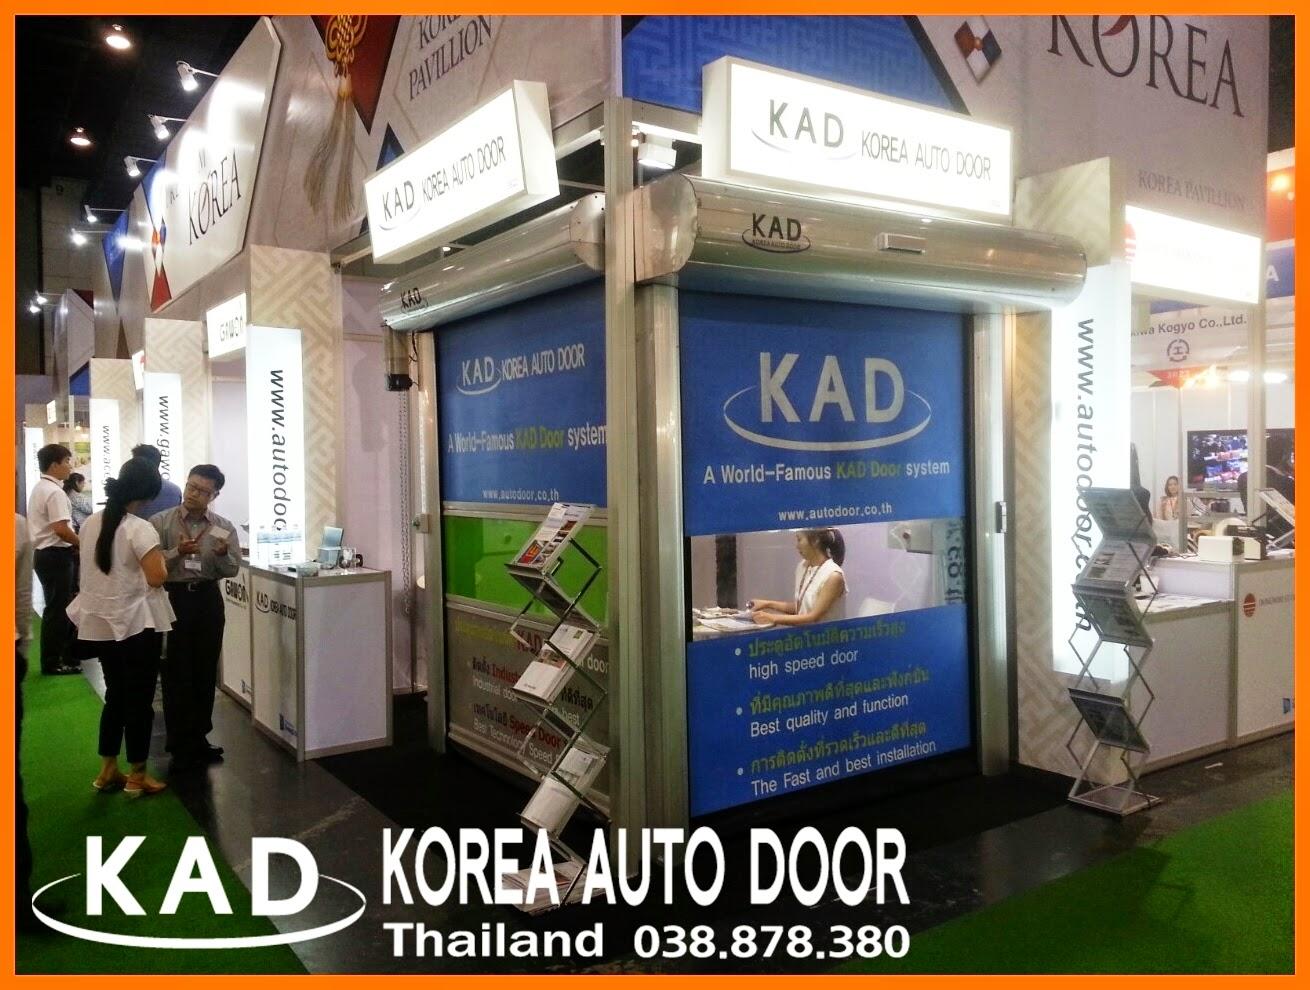 KAD ประตูอัตโนมัติความเร็วสูง exhibits in expo